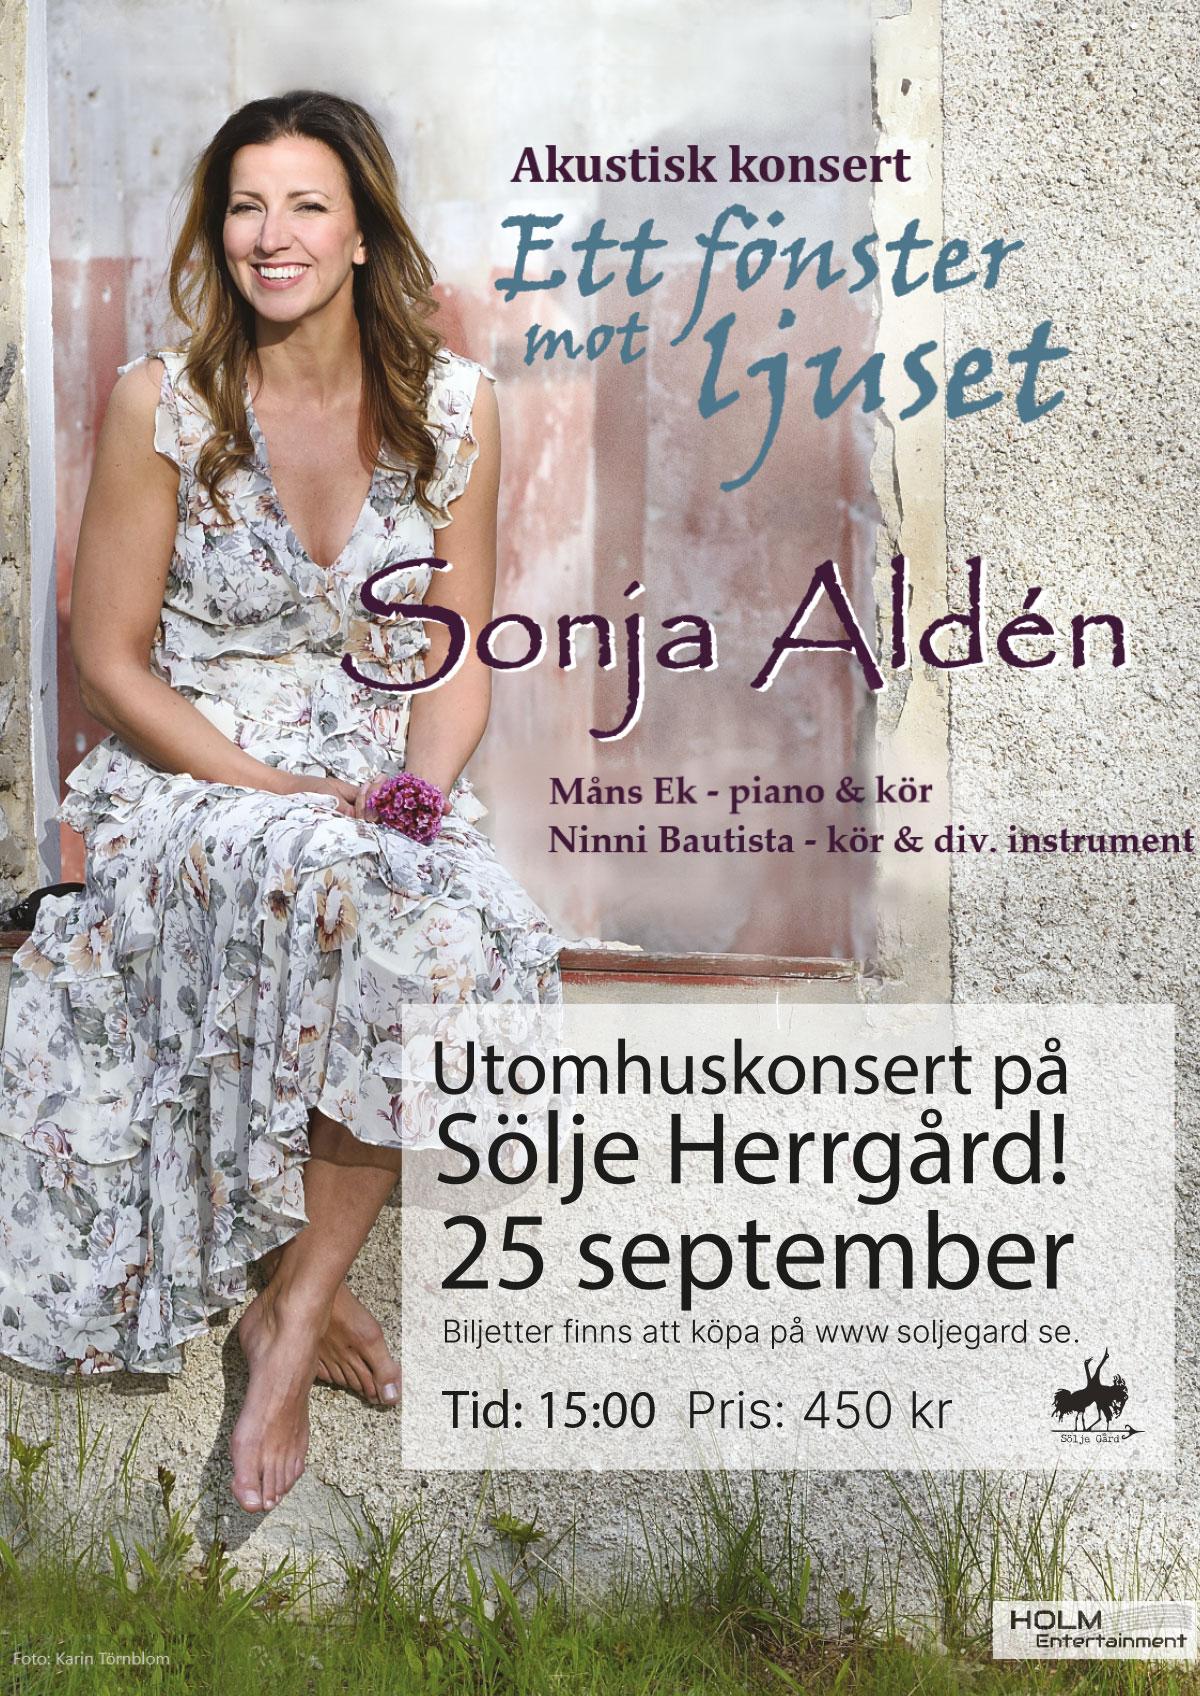 Sonja Aldén 25 september